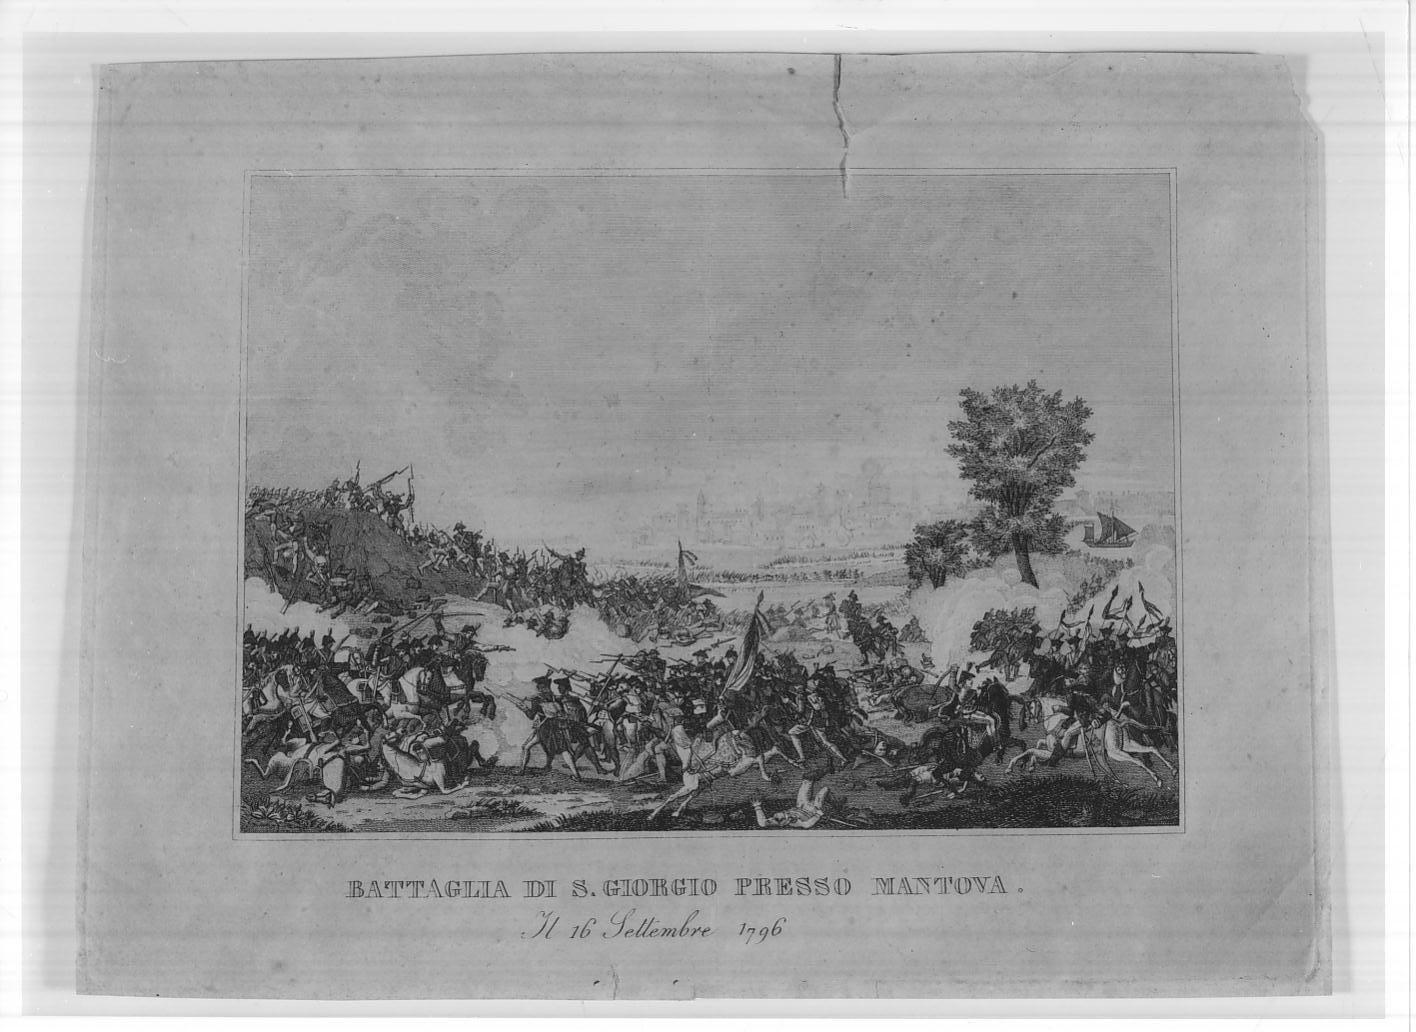 Battaglia di San Giorgio presso Mantova del 15 settembre 1796 (stampa smarginata) di Duplessi Bertaux Jean, Dupréel J.D.B, Vernet Carle (sec. XIX)